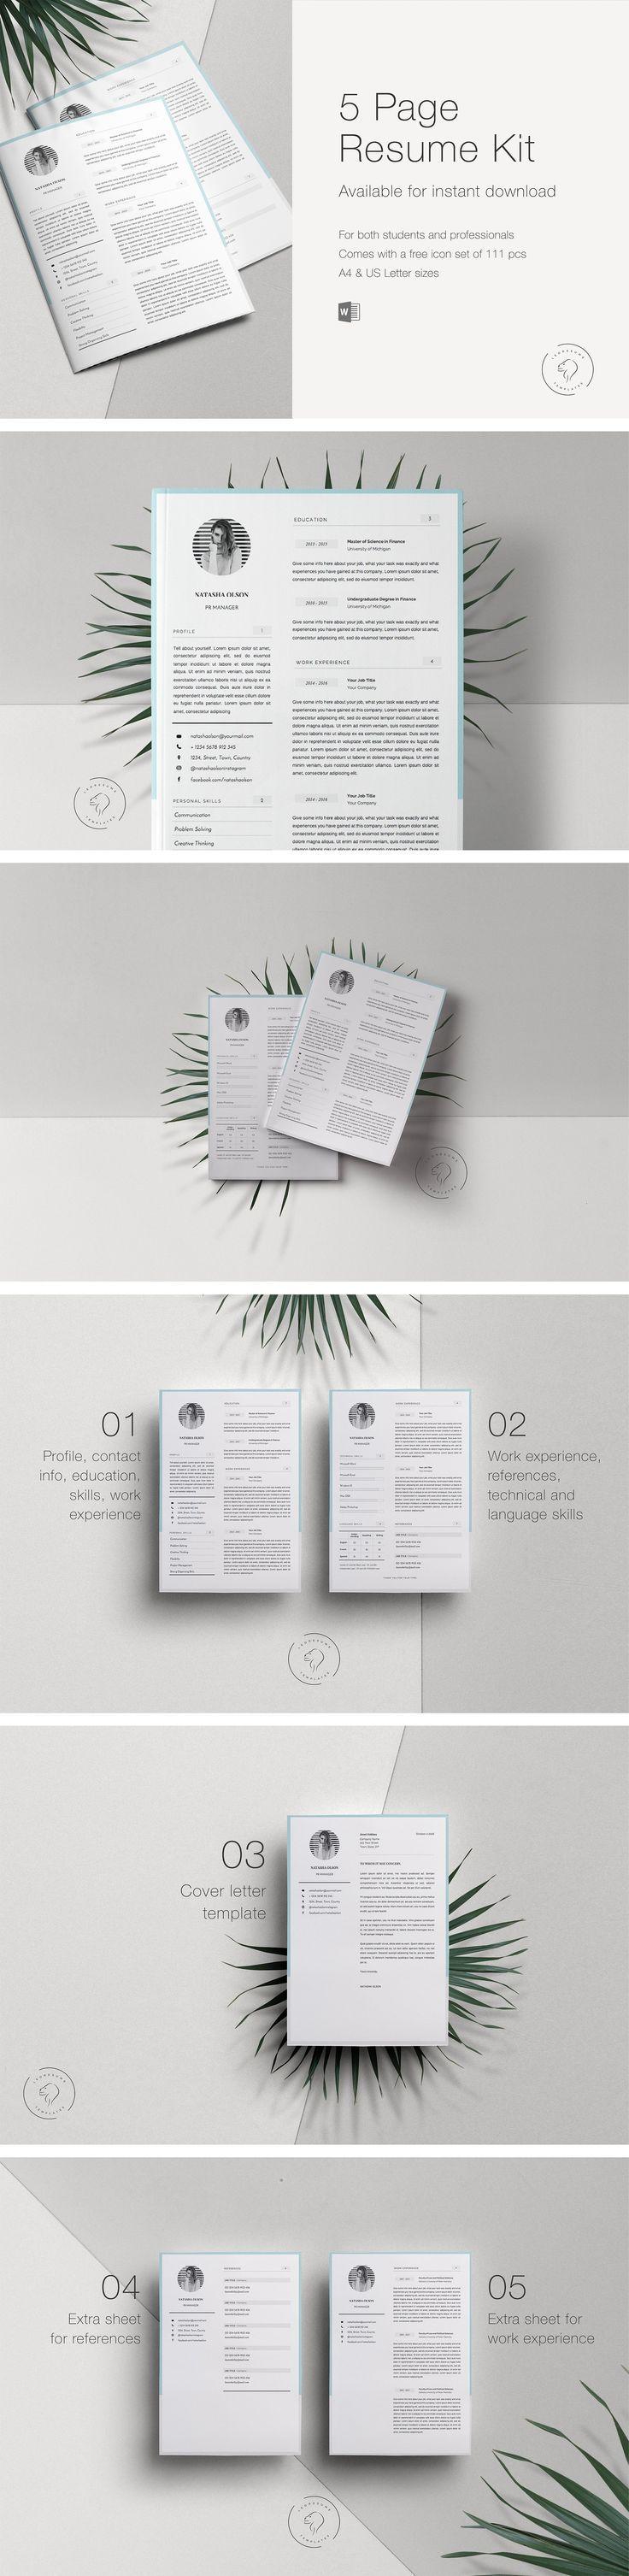 Big Bundle of 7 Resume Templates 141